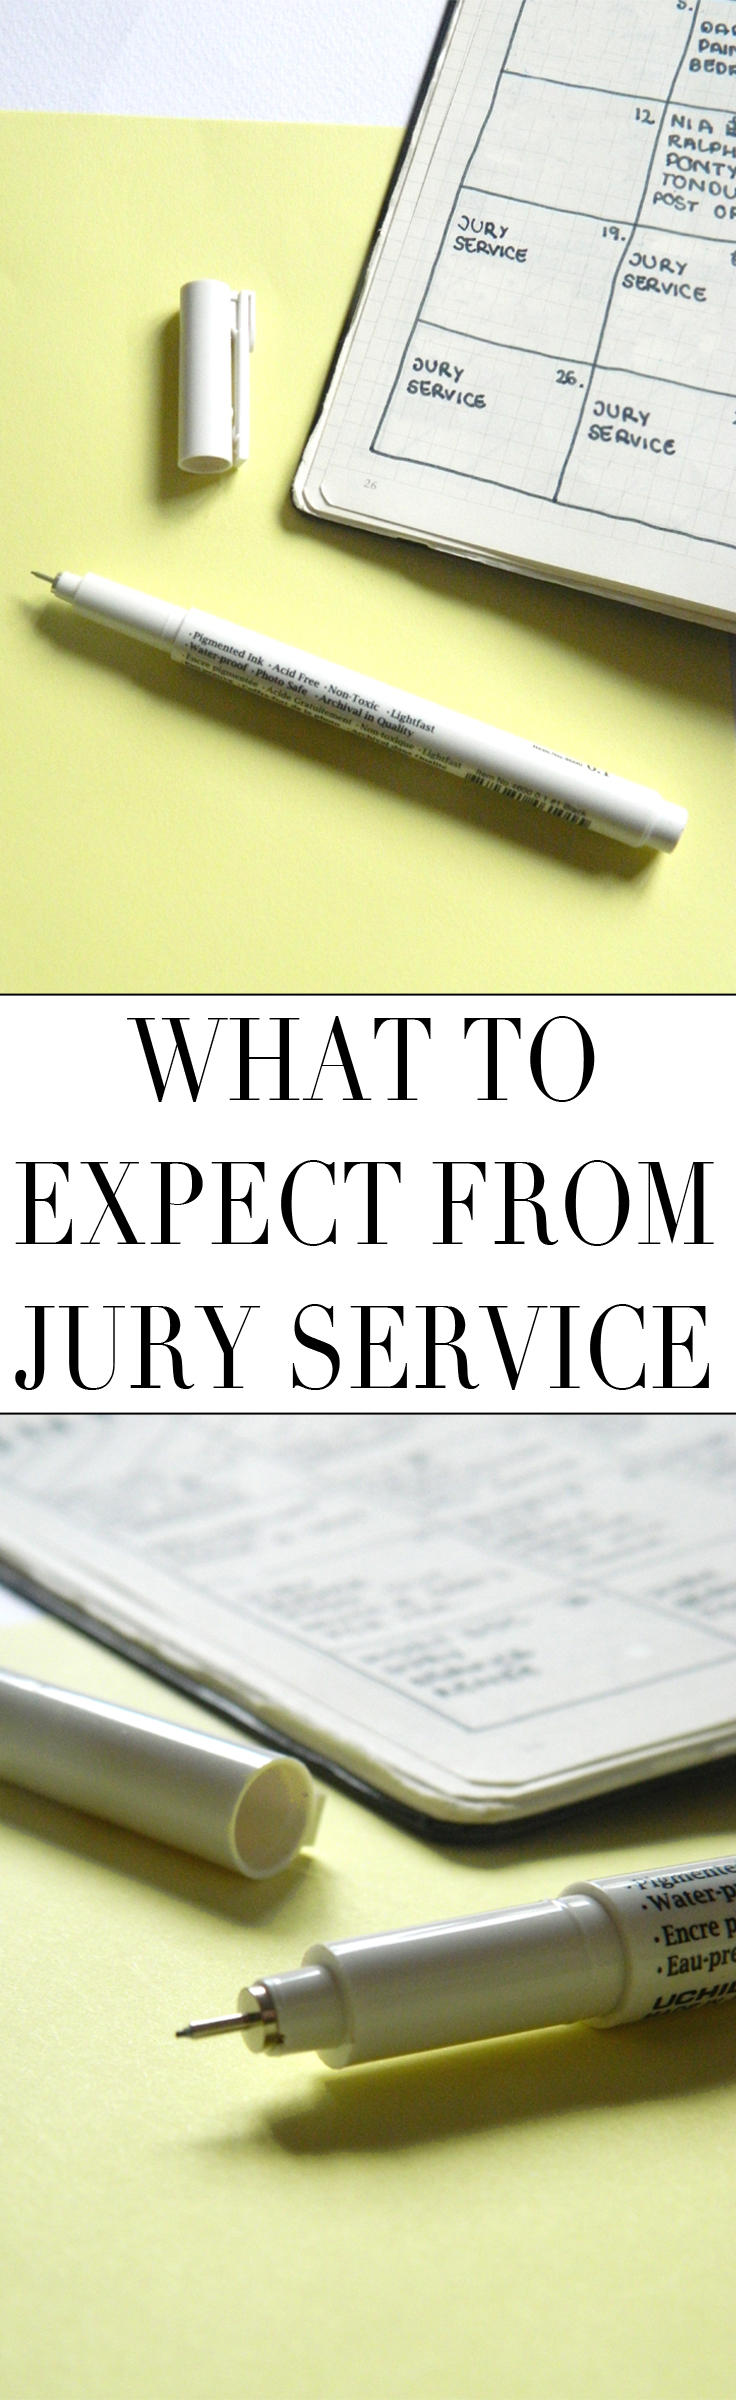 juryservice.jpg